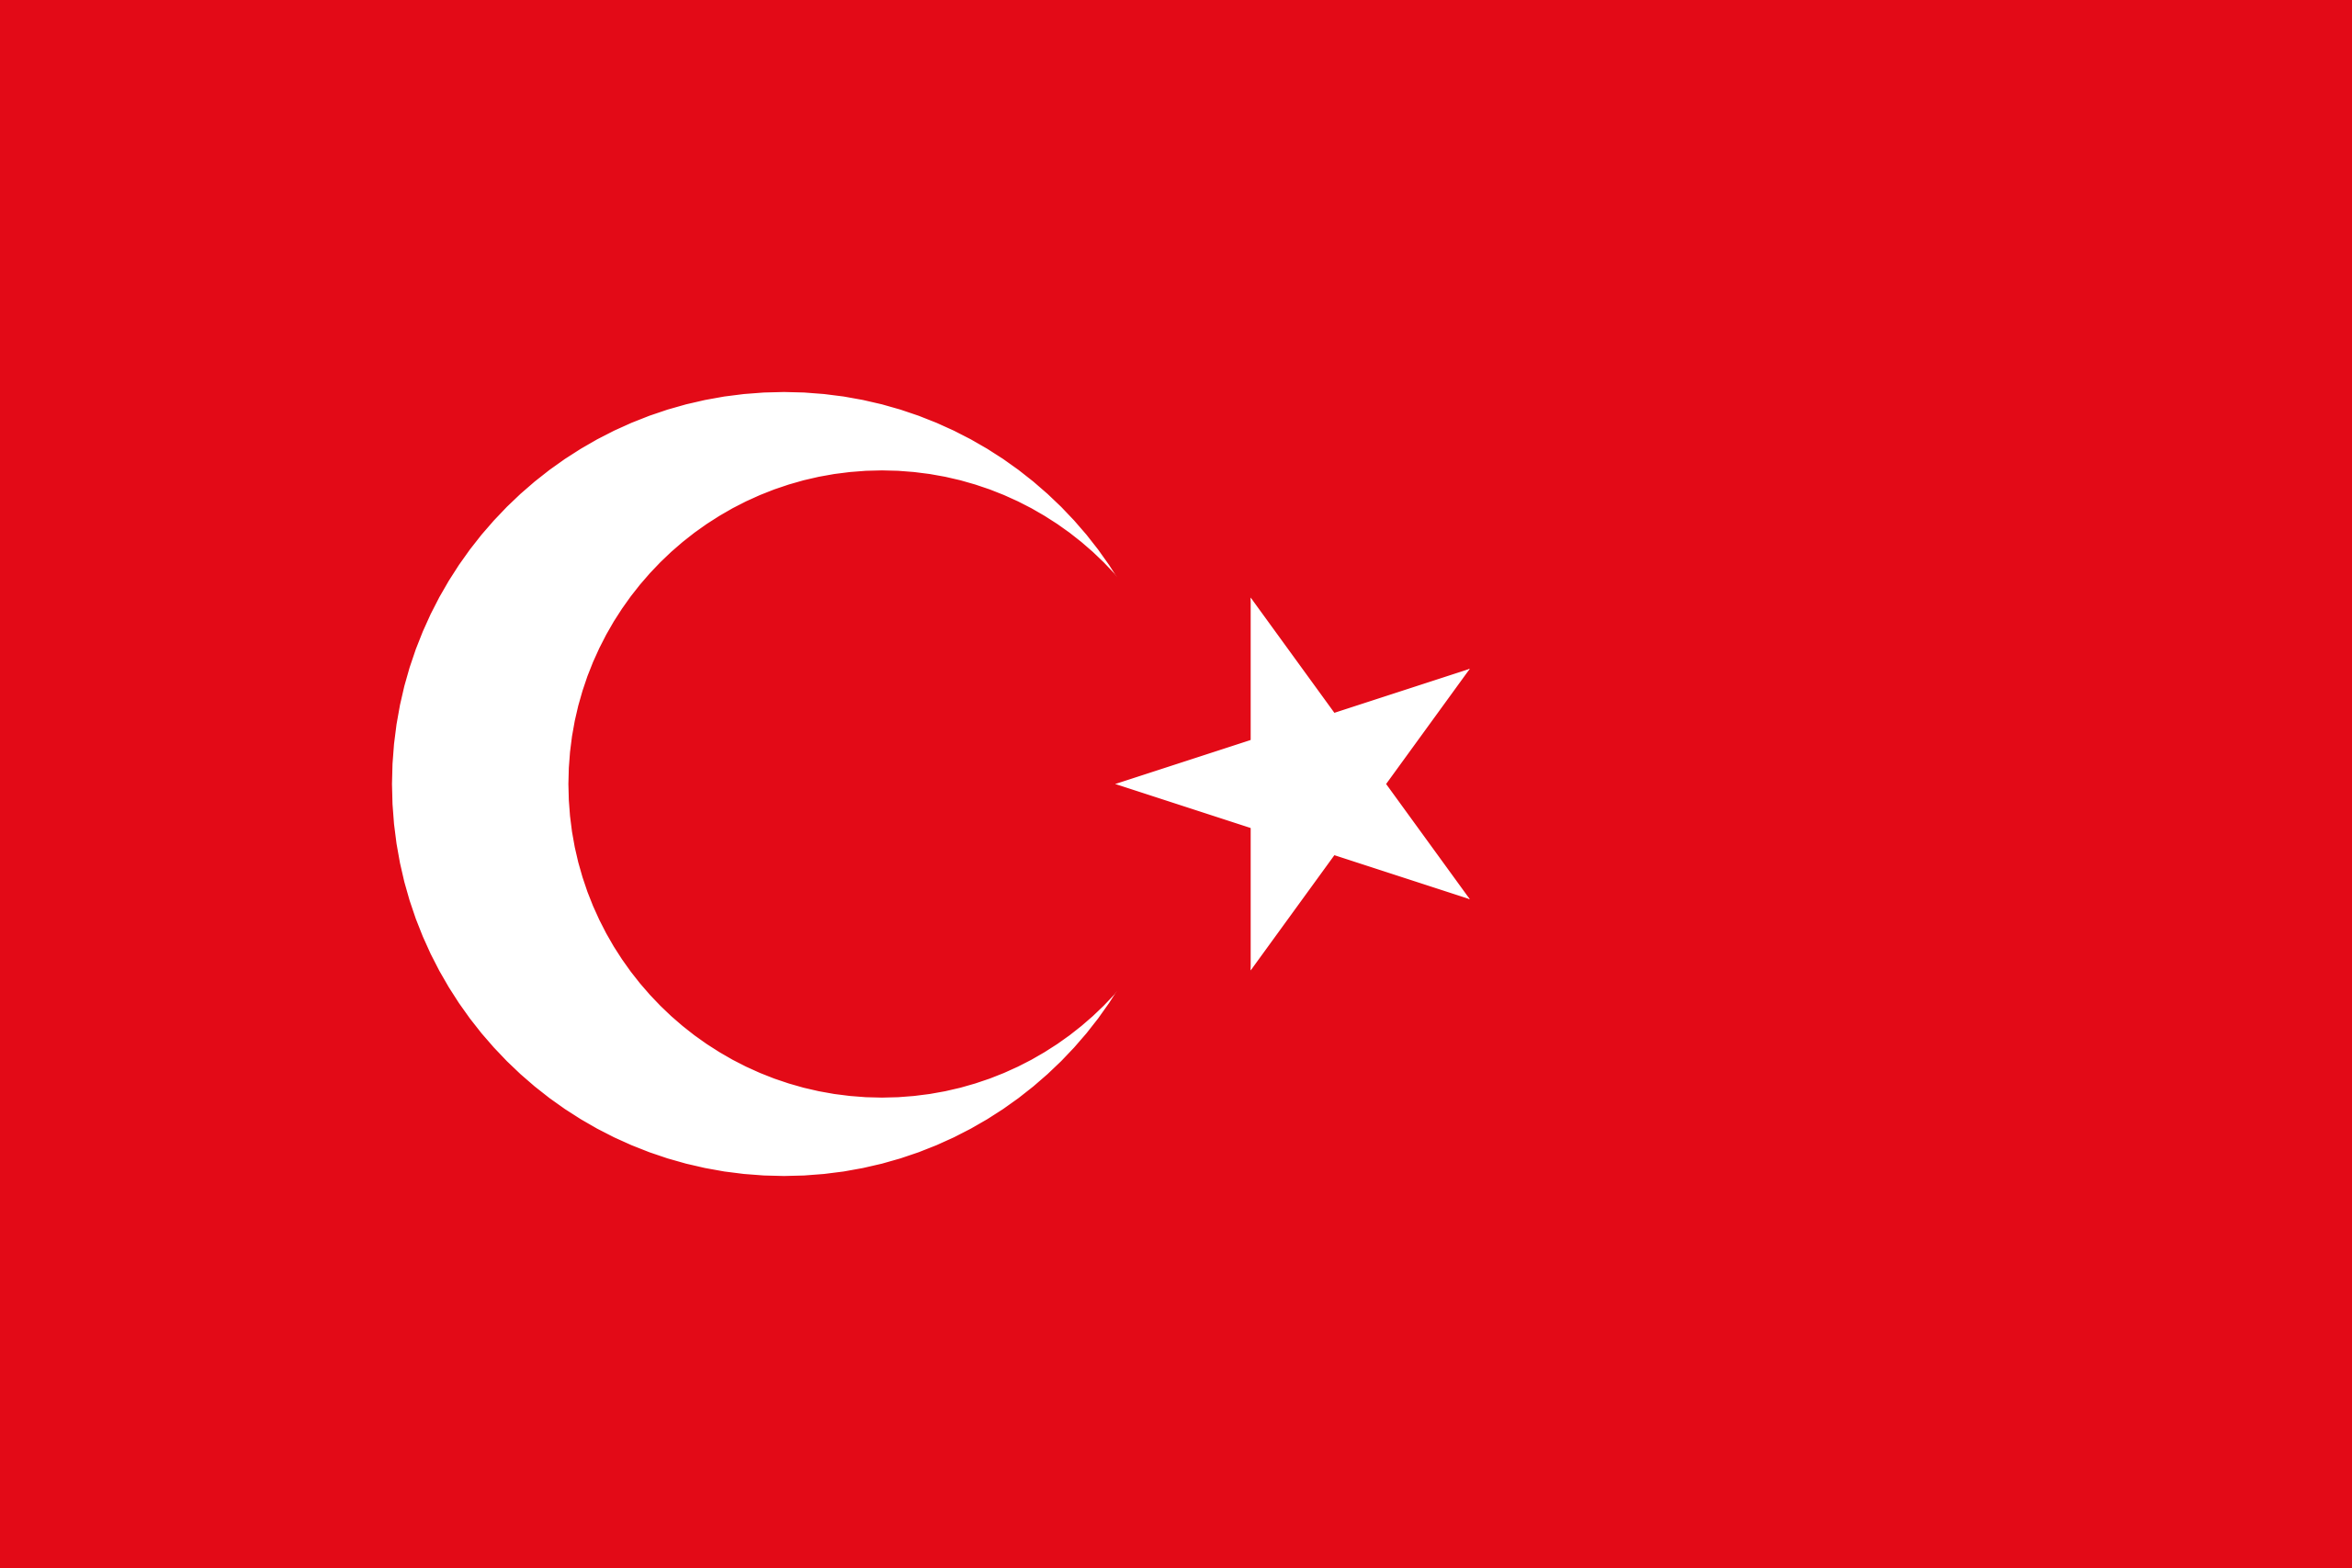 Nourkas Türkçe